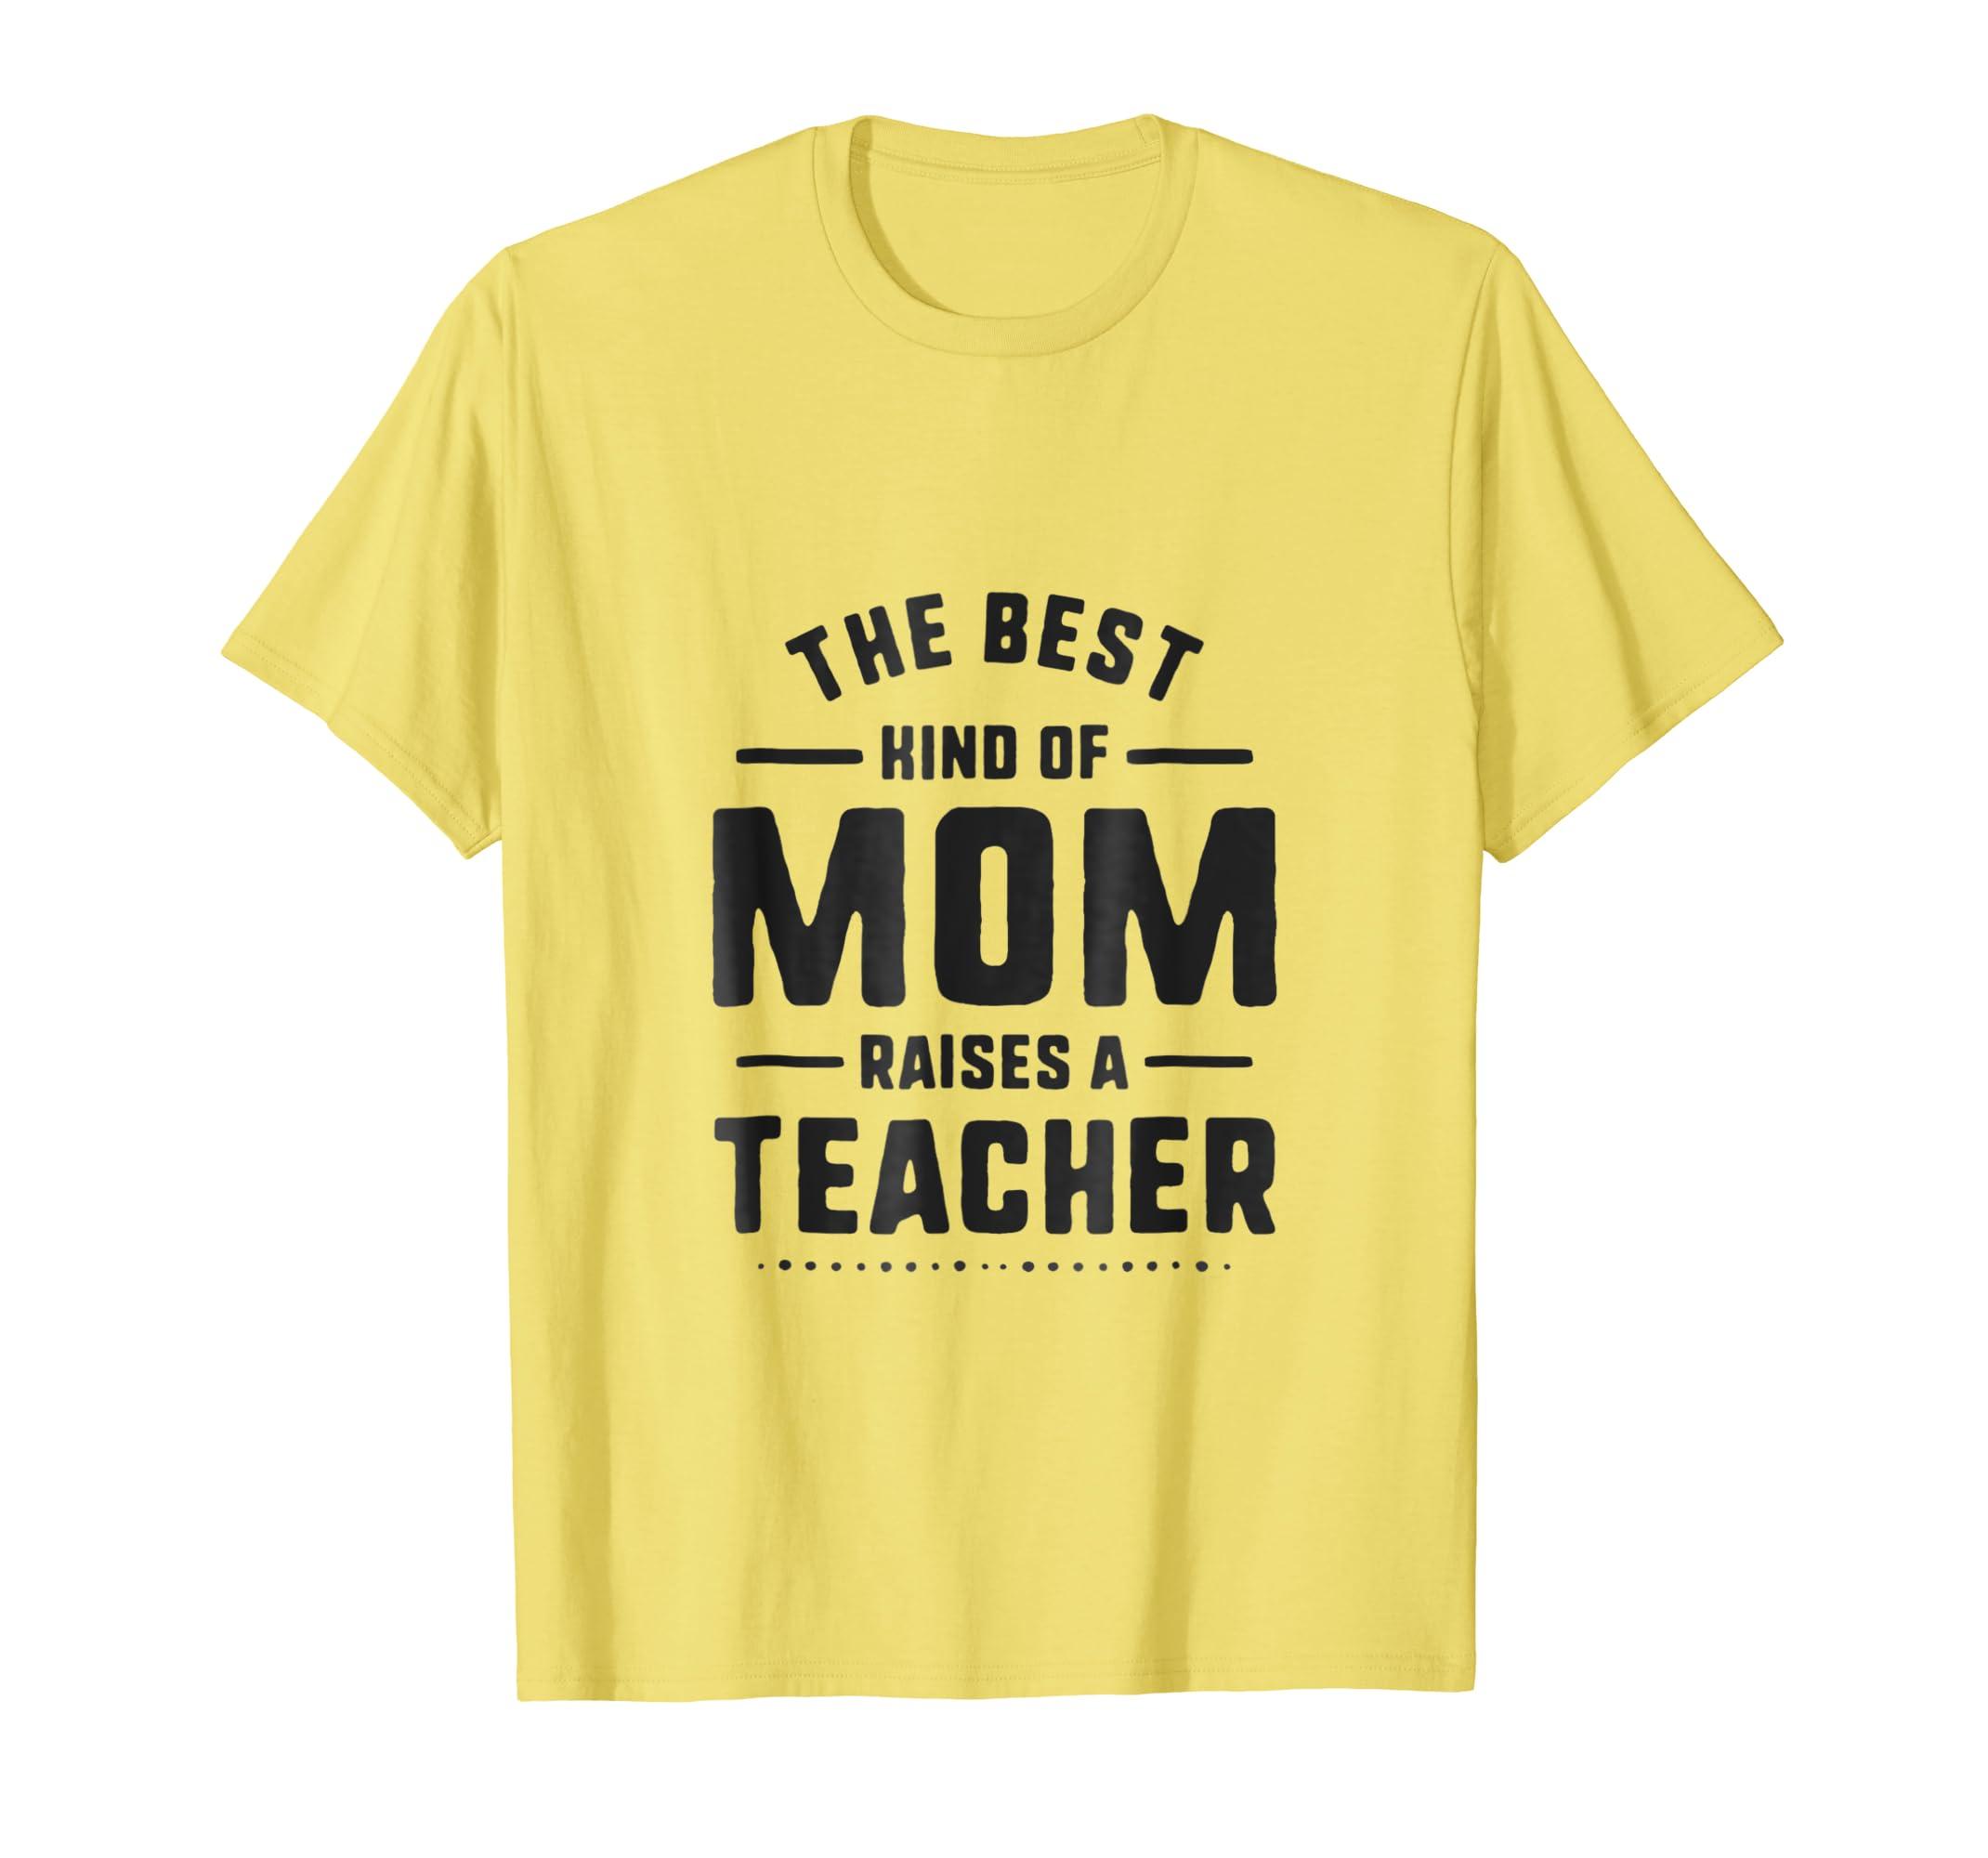 efc01ed0 Best Mom Raises A Teacher Shirt Mothers Day Gift for Women-alottee gift